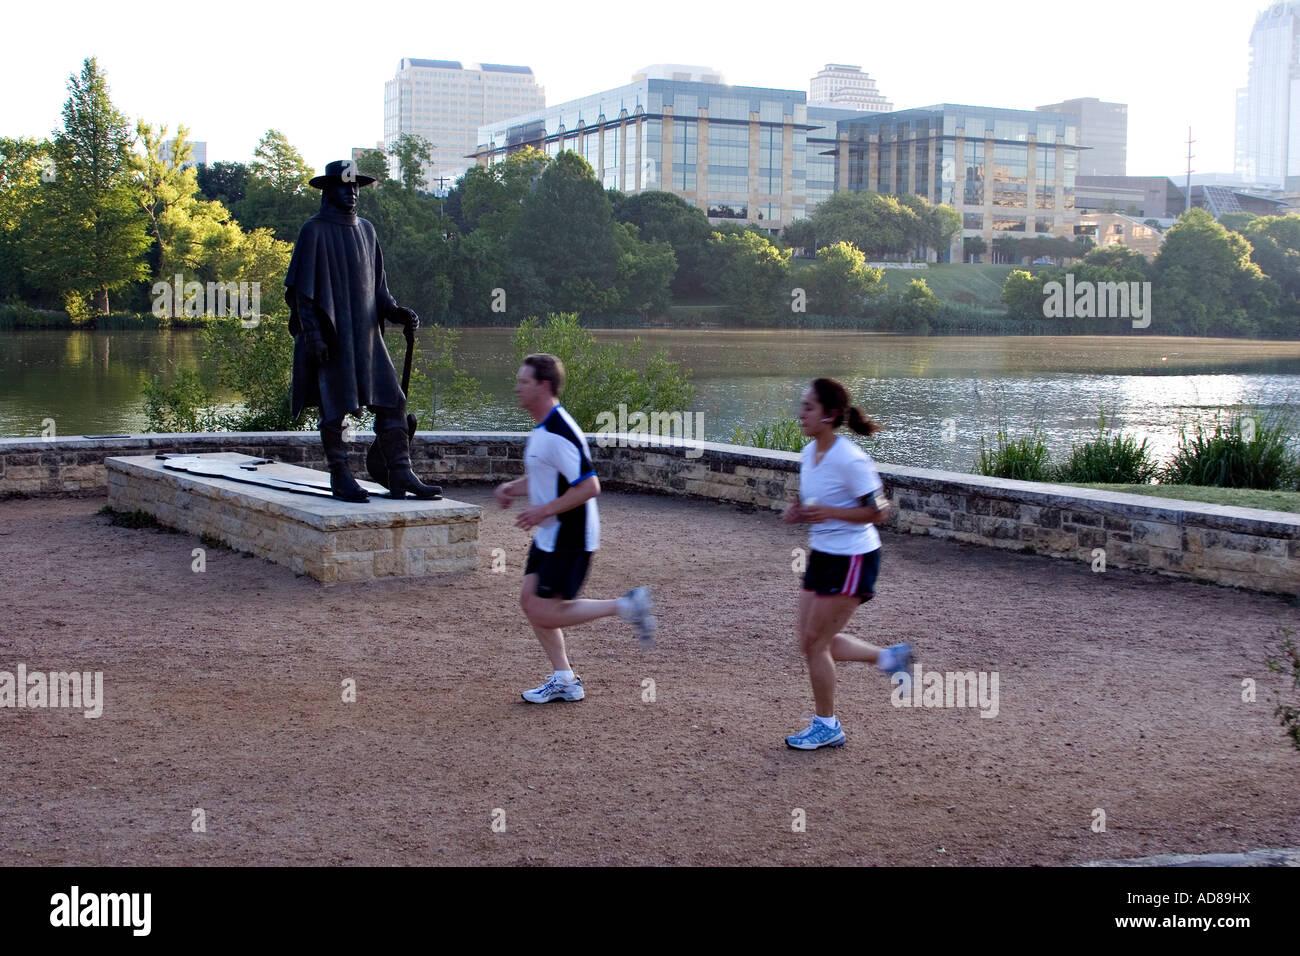 Joggers run past the Stevie Ray Vaughn memorial statue in Austin Texas - Stock Image